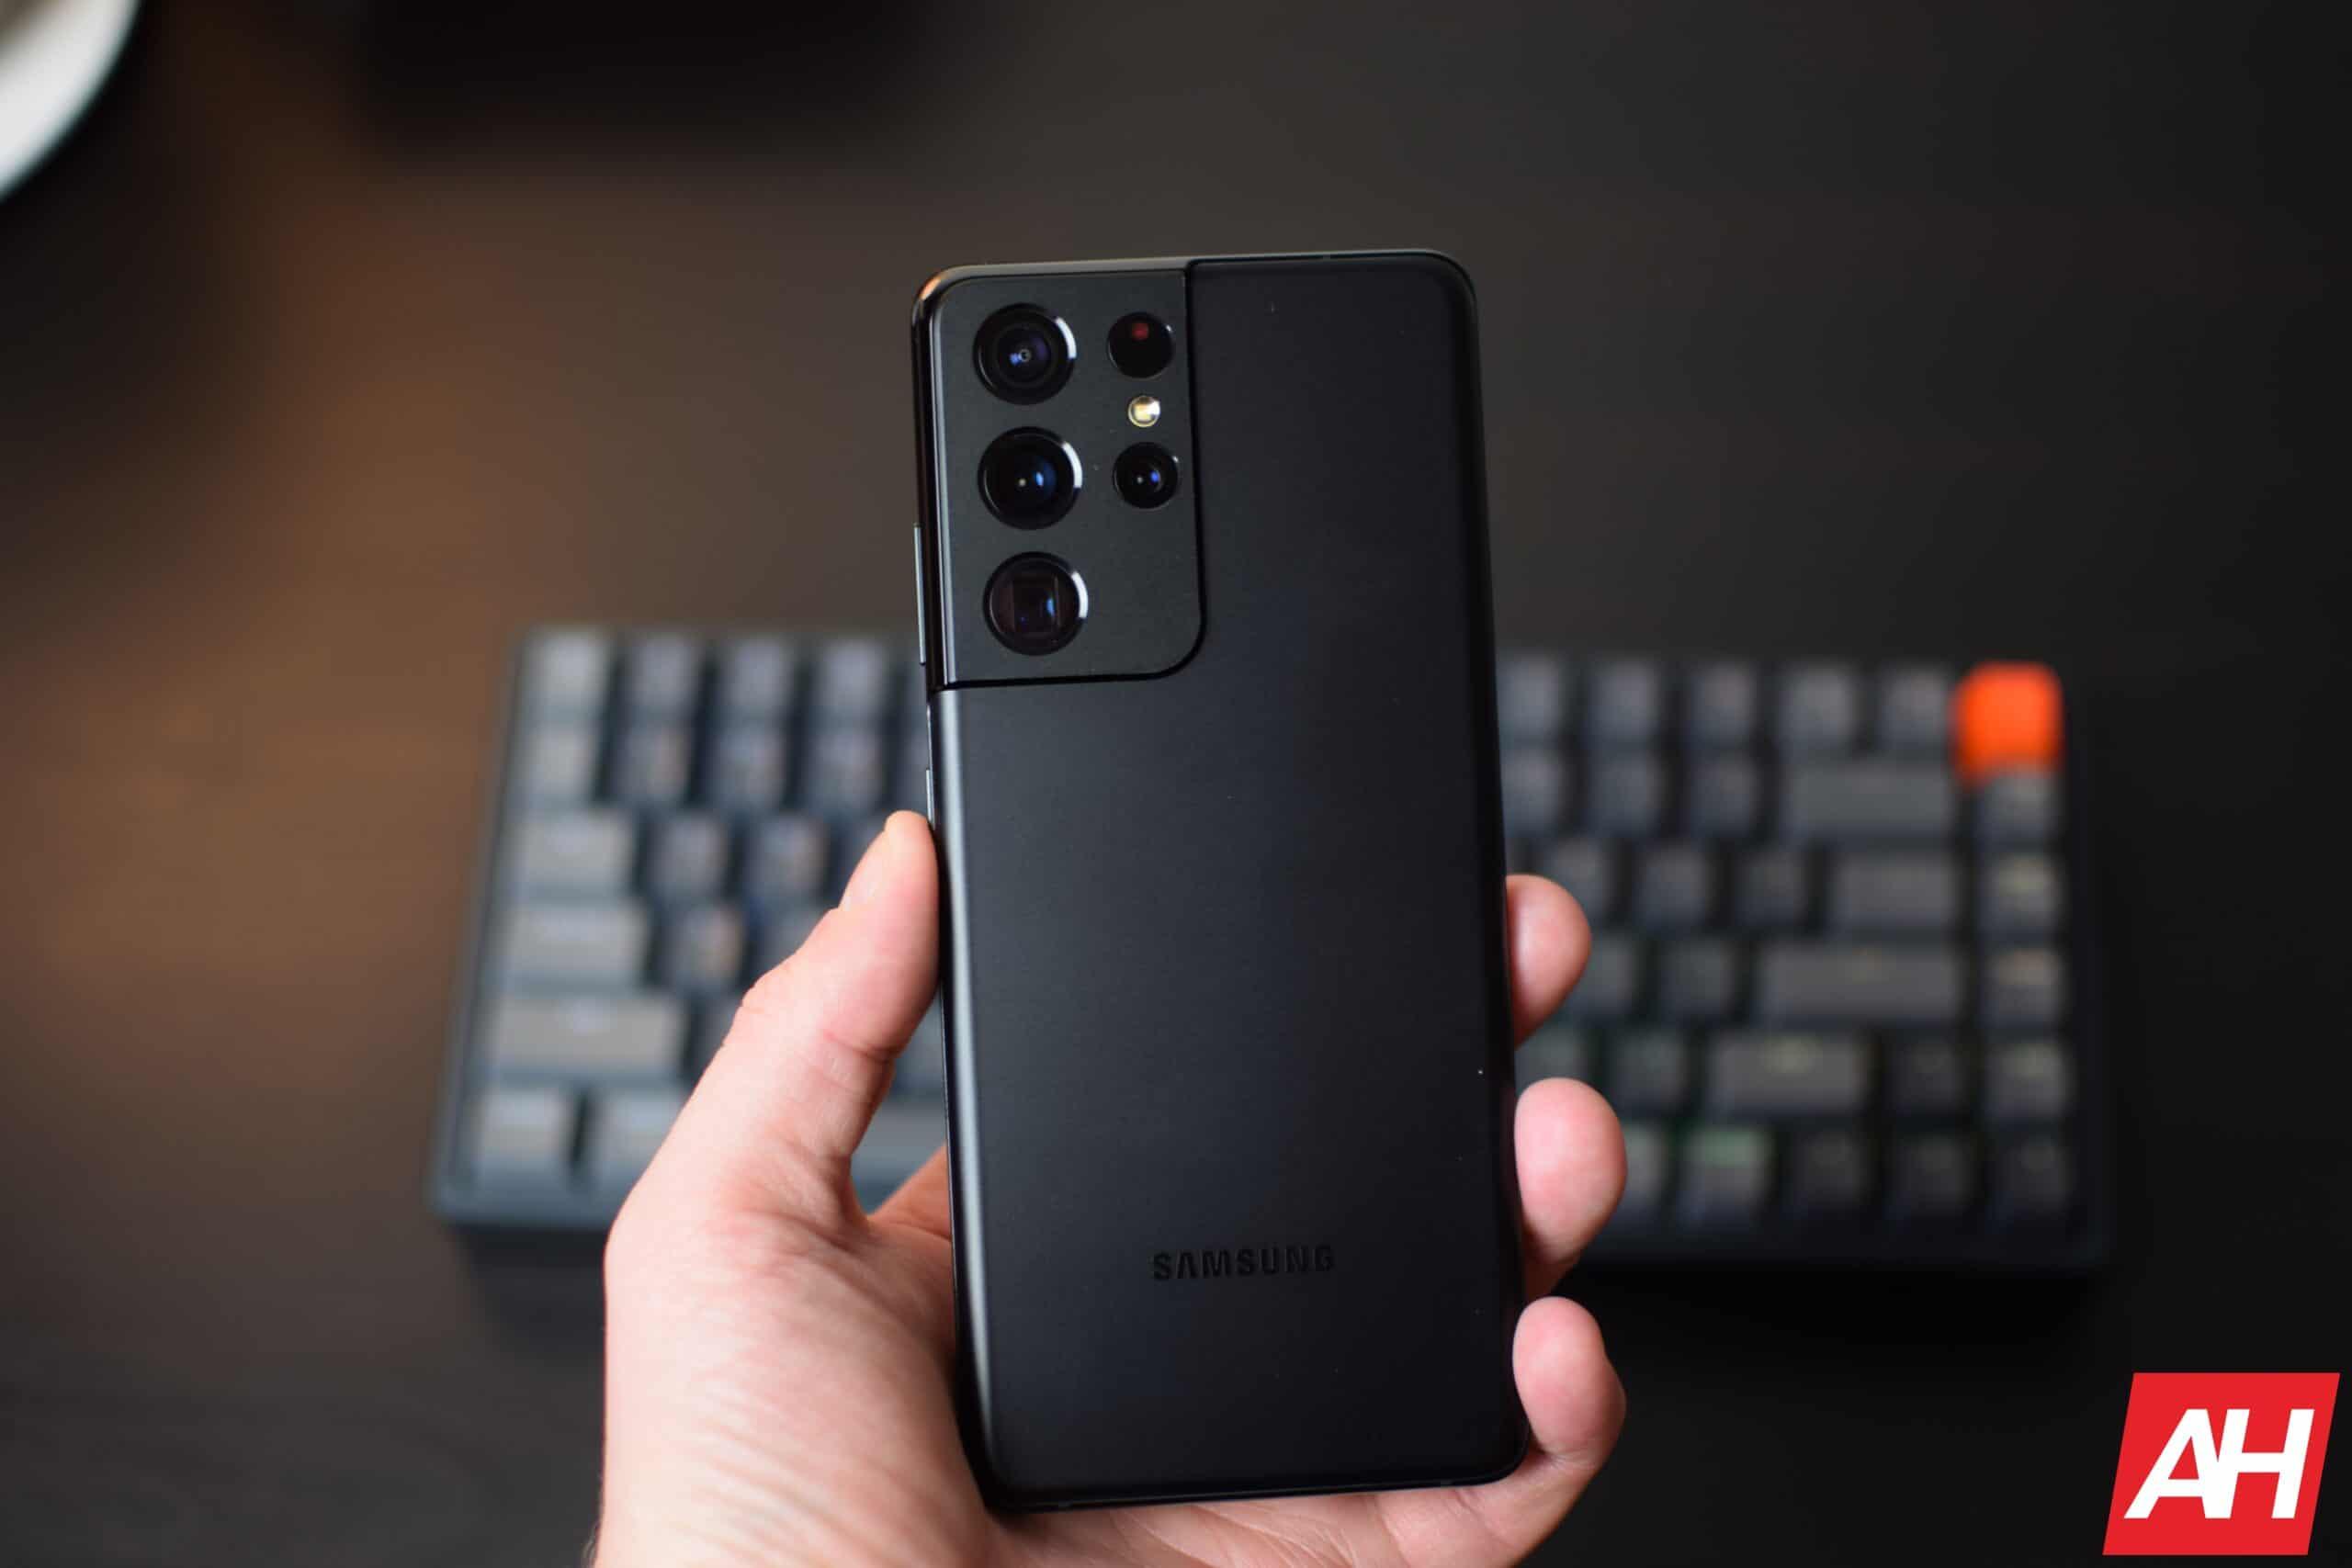 Samsung Galaxy S21 Ultra Hands On AH 7